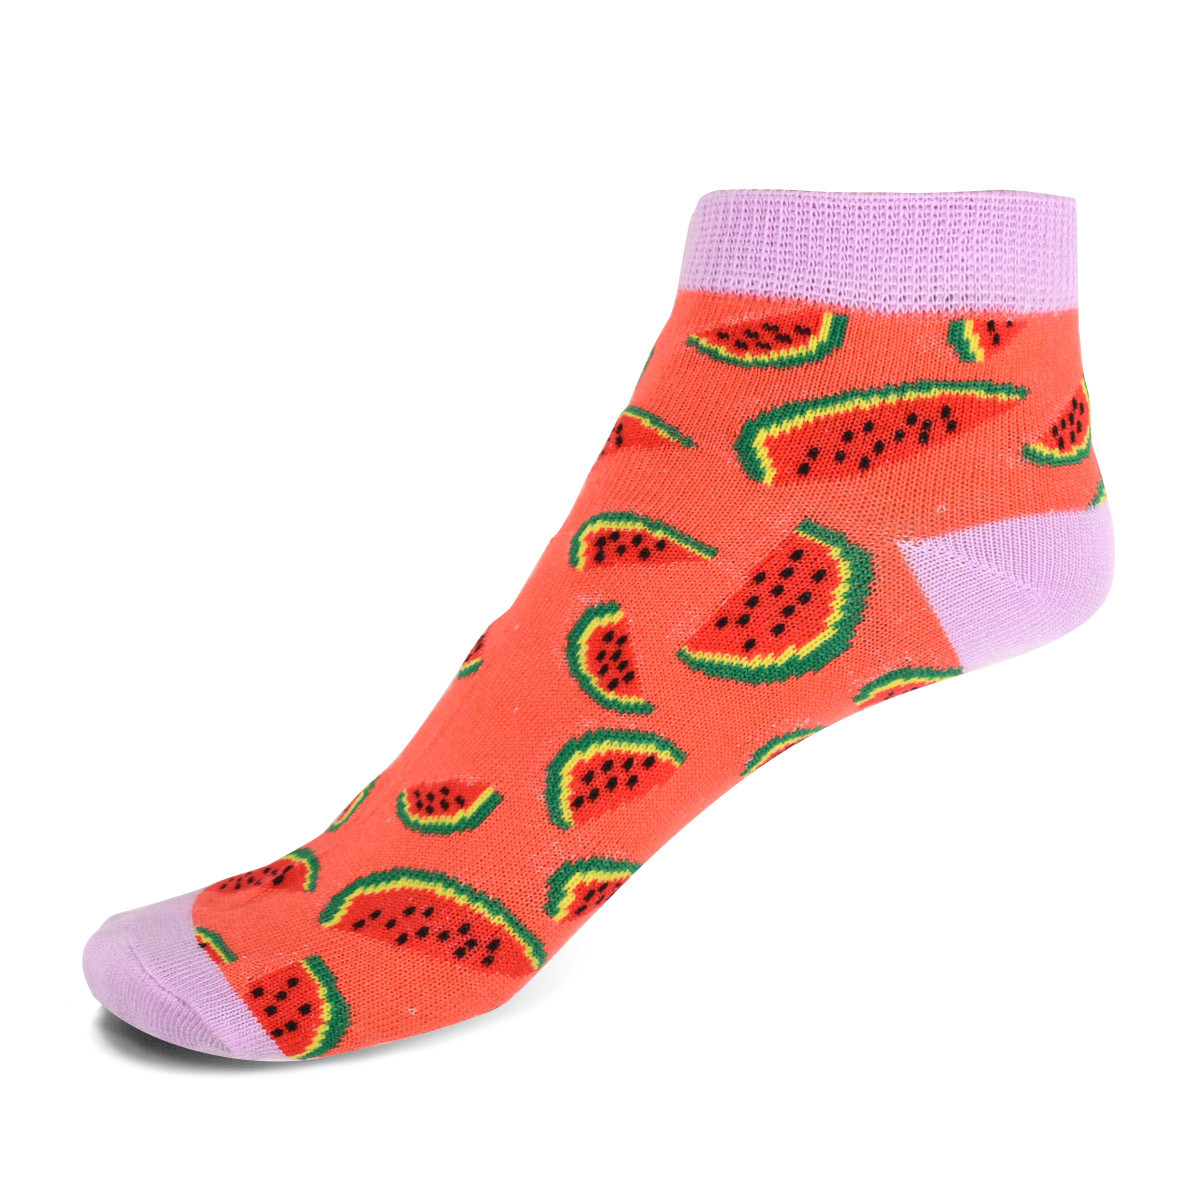 Assorted Pack (6 pairs) Women's Watermelon Novelty Low Cut Socks EBA-679